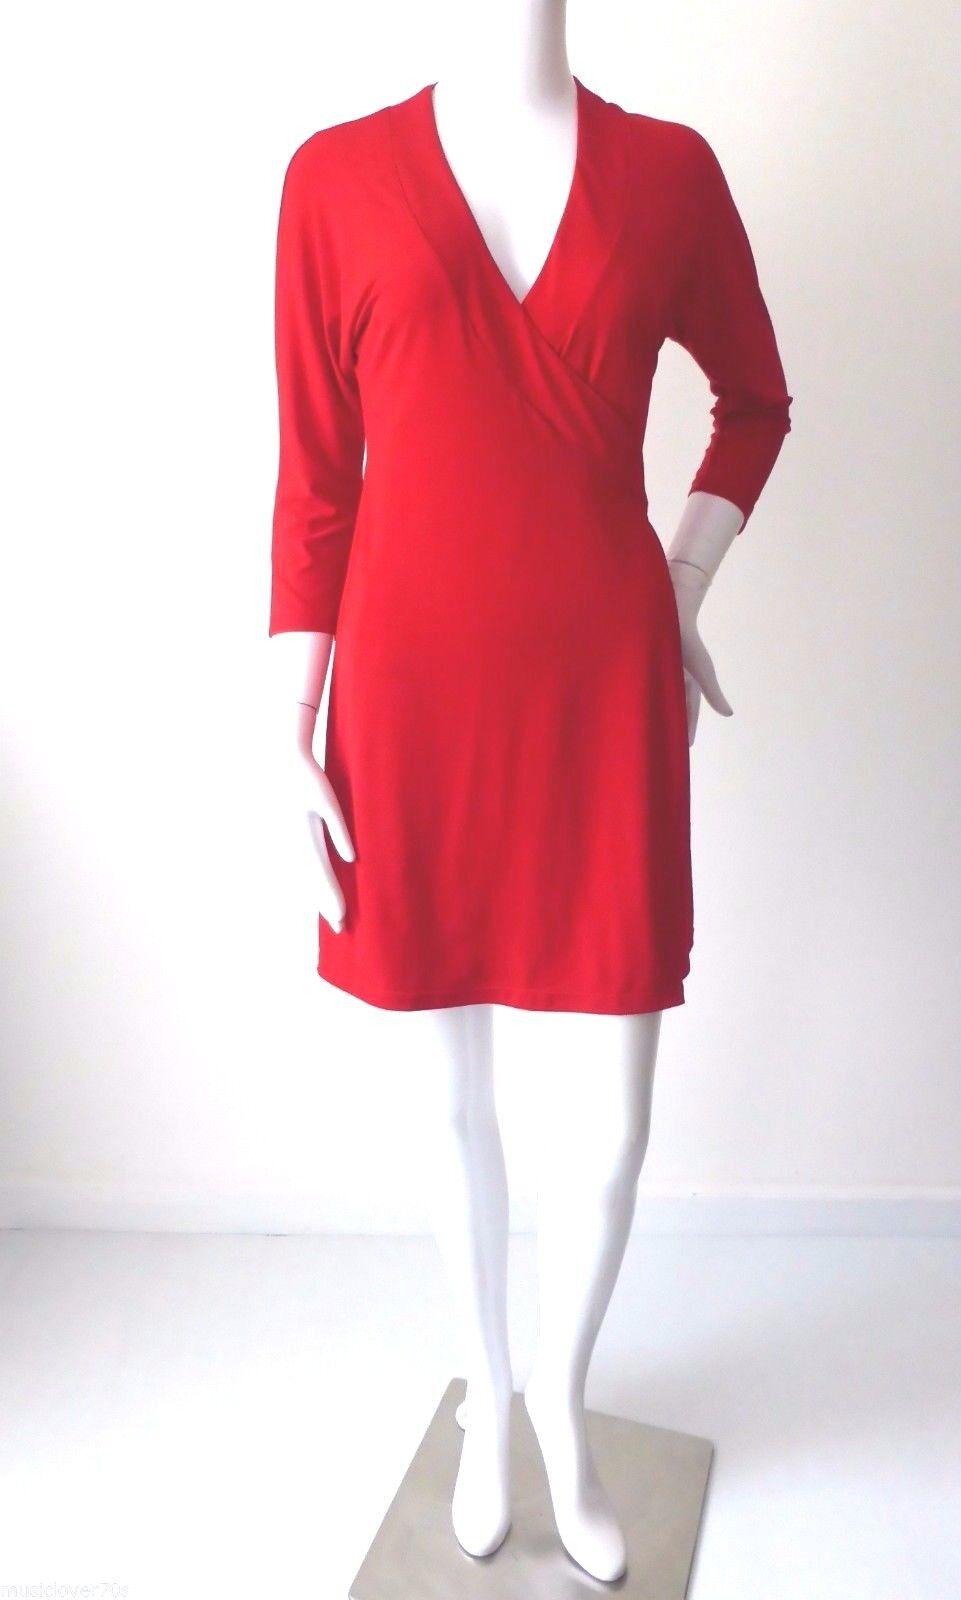 PILGRIM -  NWT Größe 10  US 6 Dress Made in Australia rot Wrap Mini